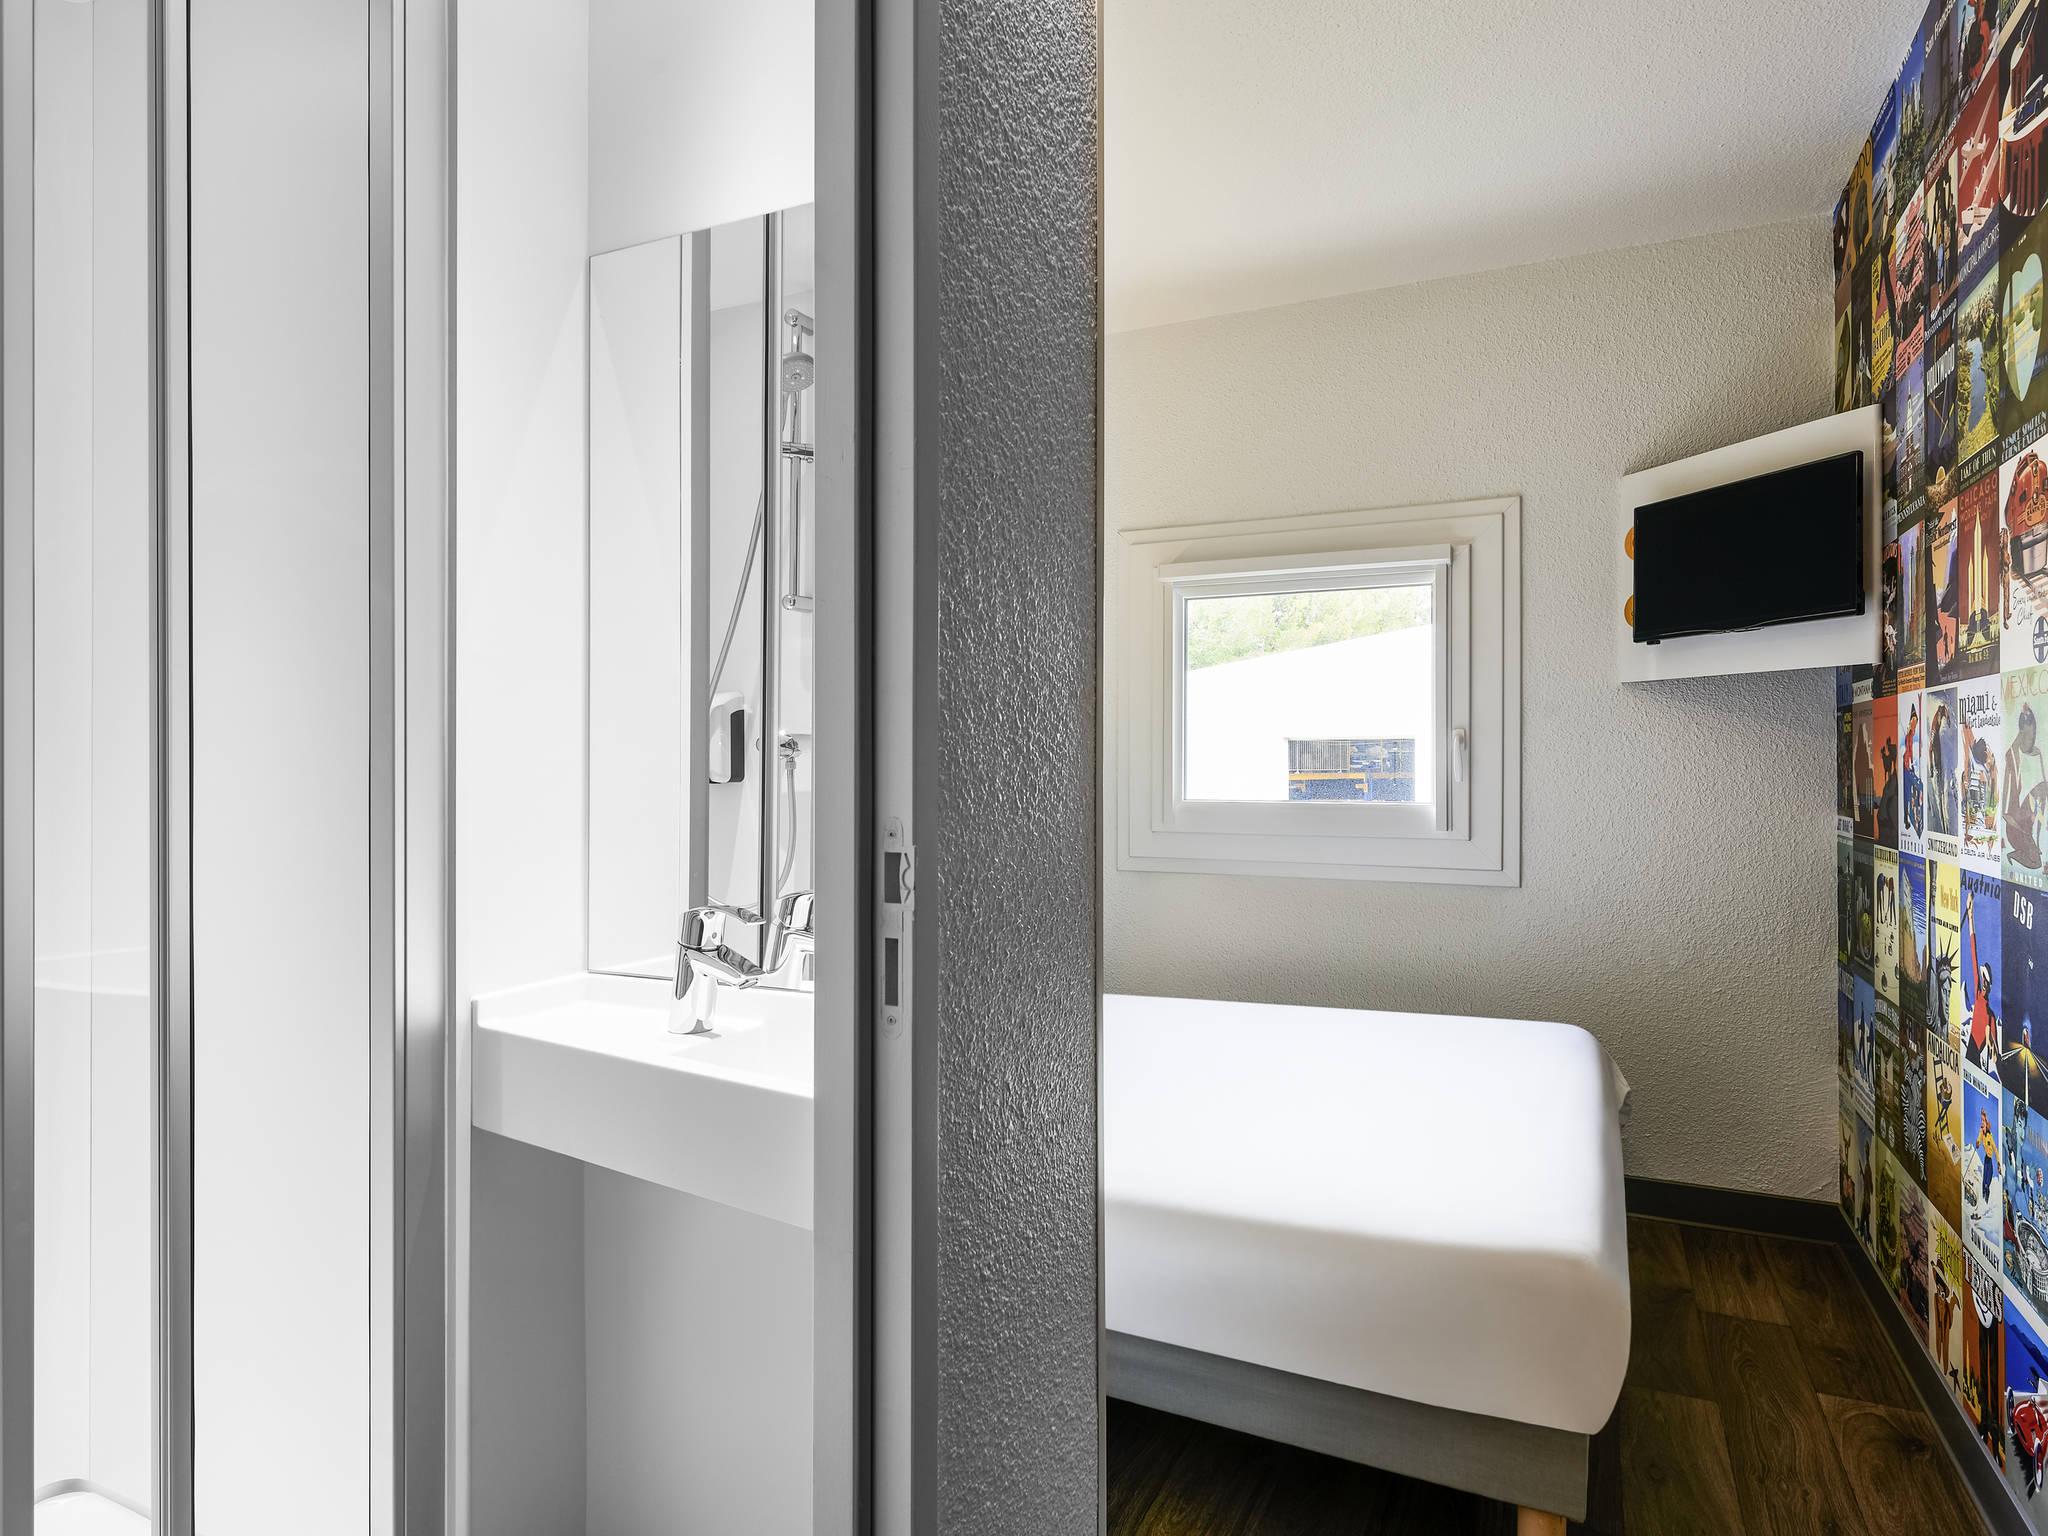 Hotel in RUNGIS - hotelF1 Rungis Orly on